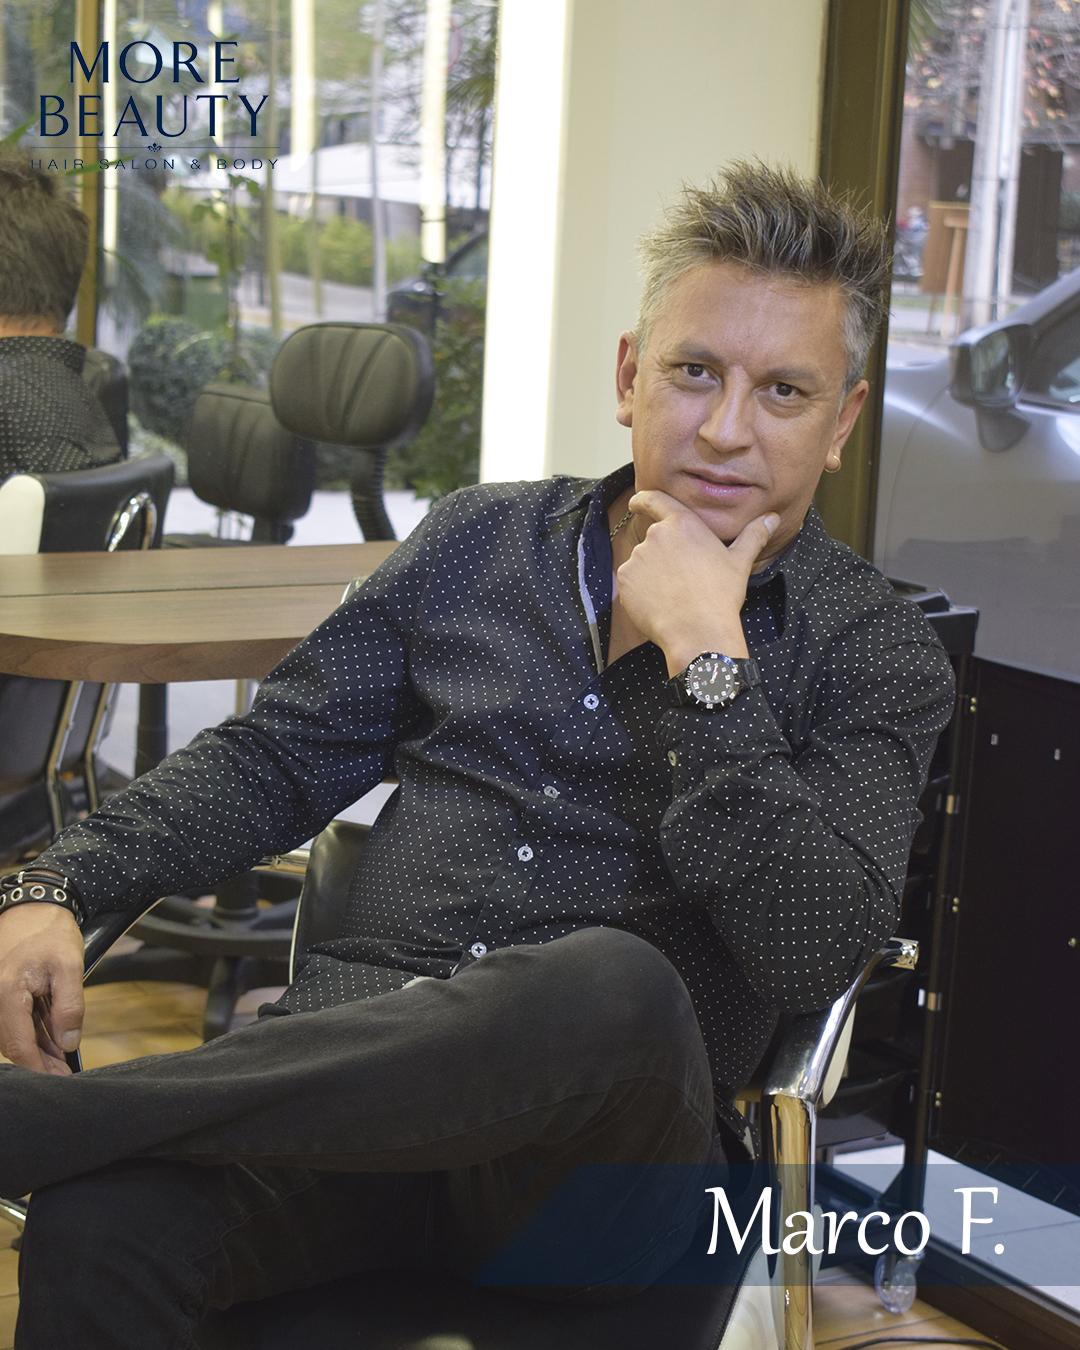 Marco Foweraker